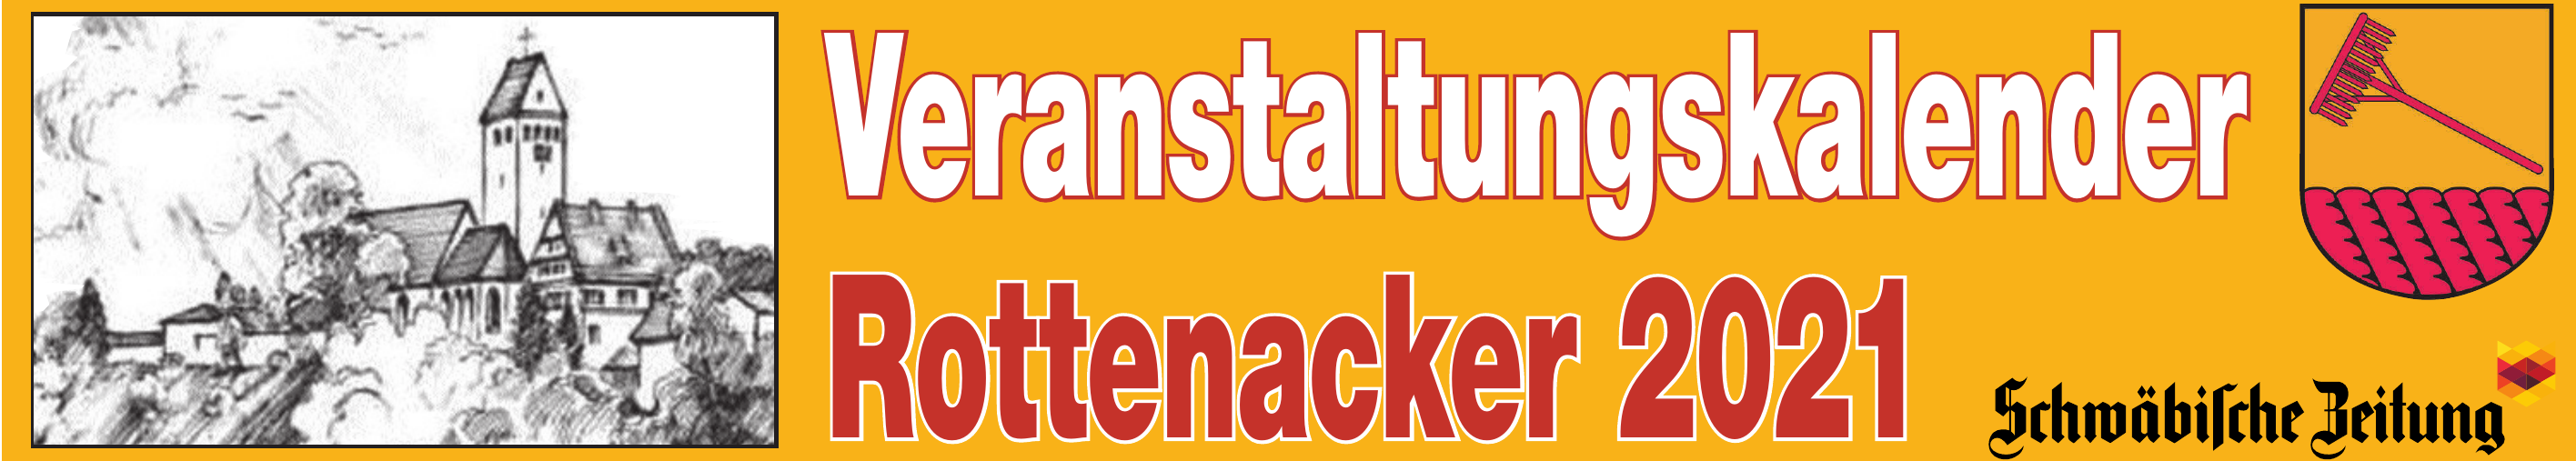 Termine Rottenacker 2021 Image 1